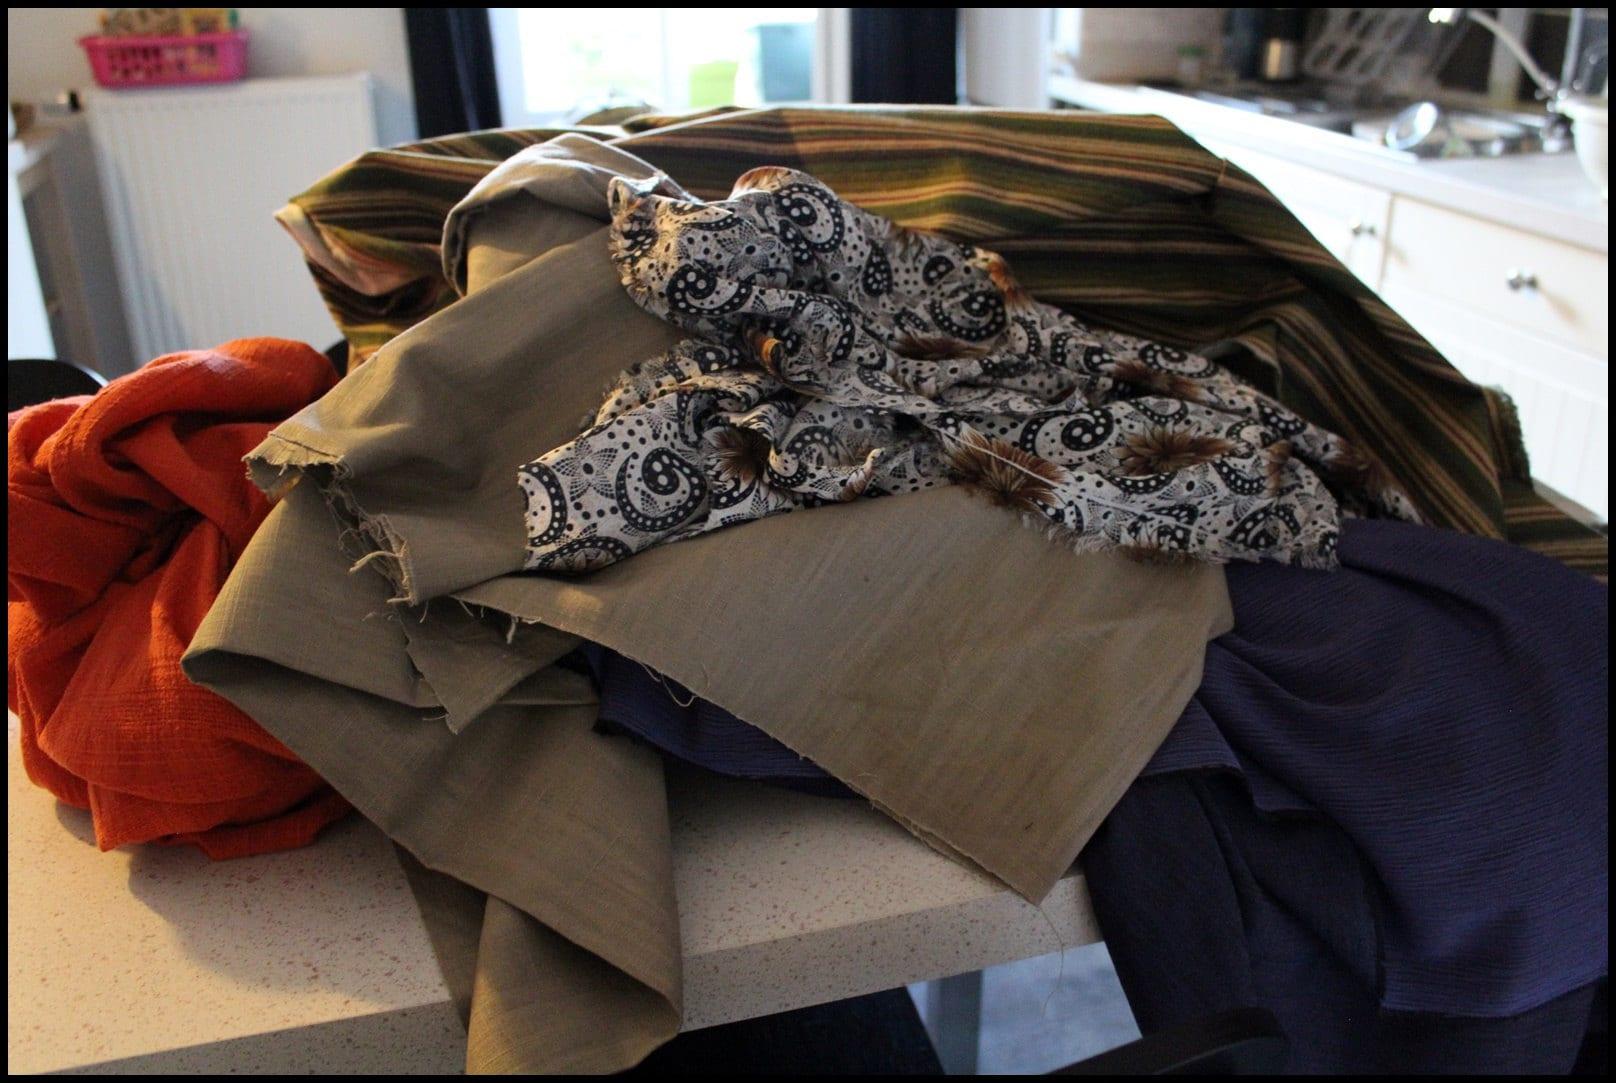 Tissus des commandes en cours - Fabrics of orders in progress